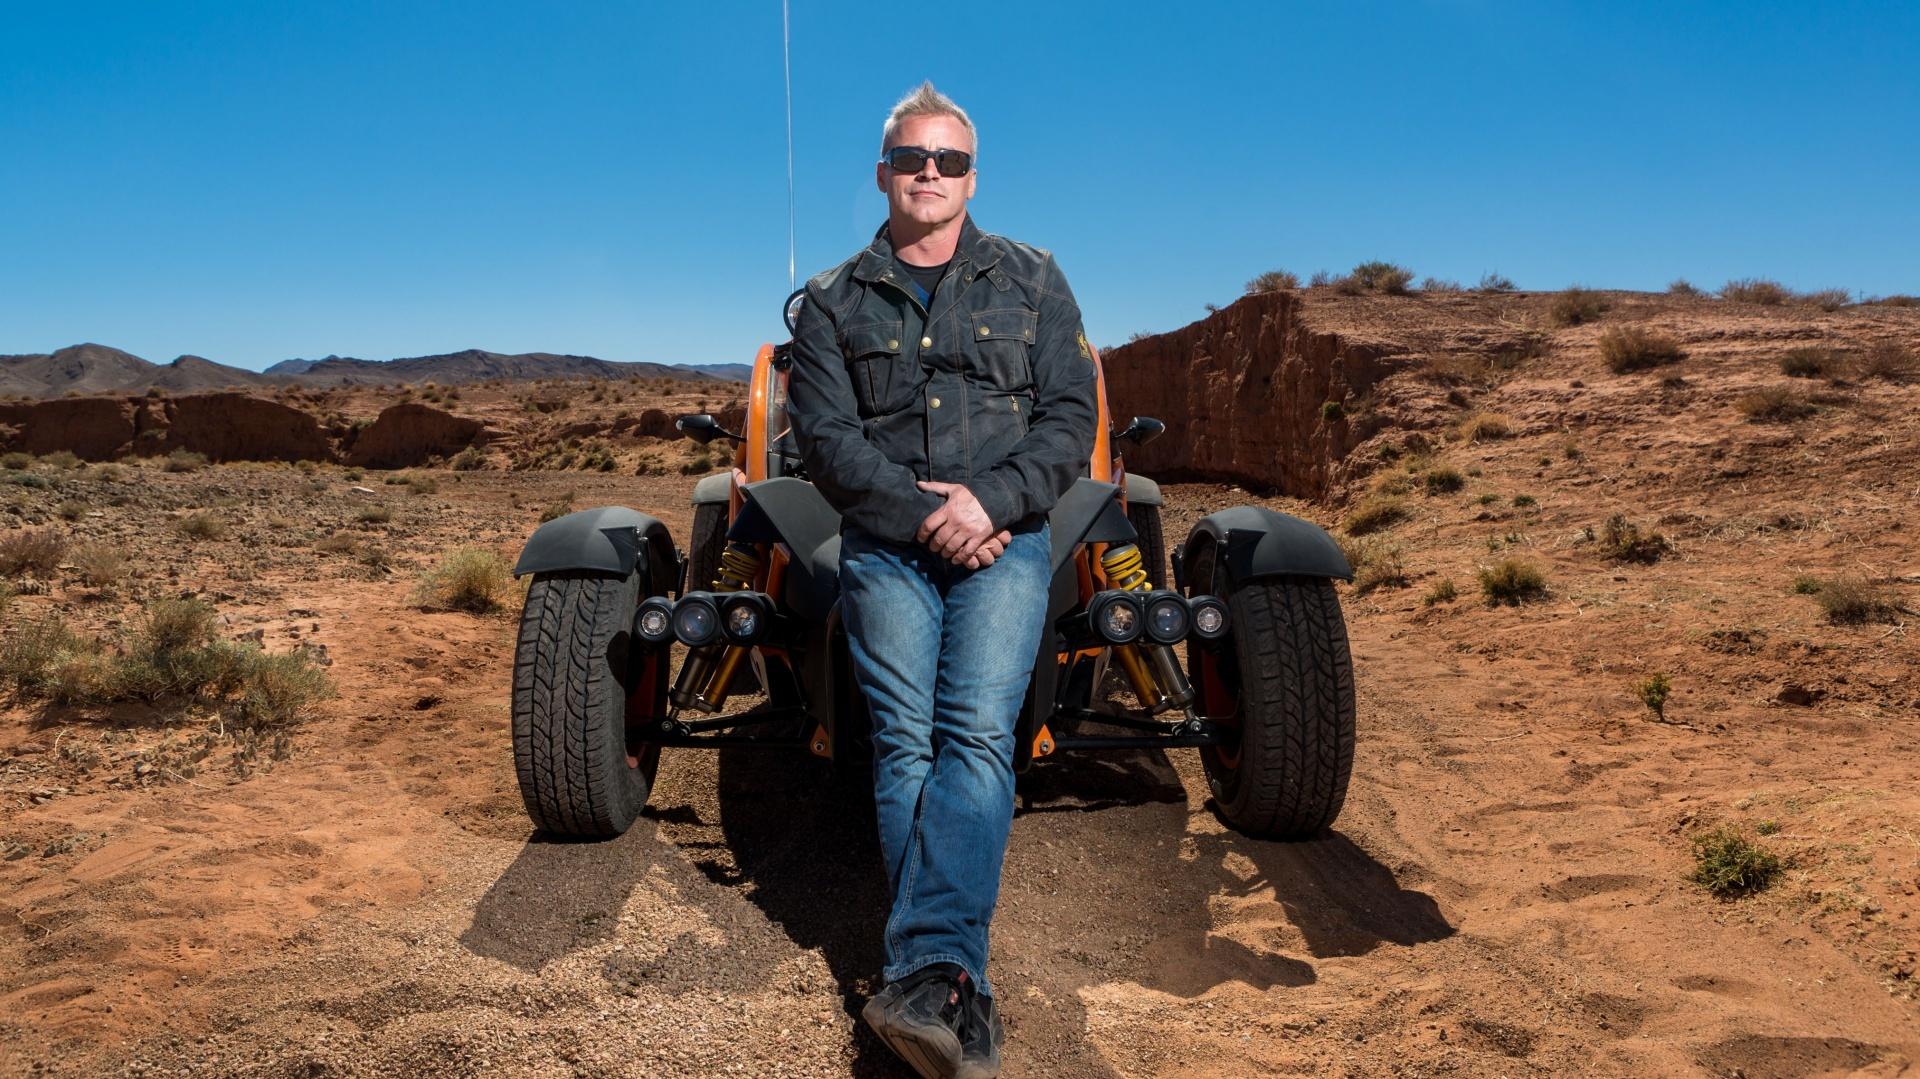 Matt LeBlanc in the new series of Top Gear (BBC / PA)